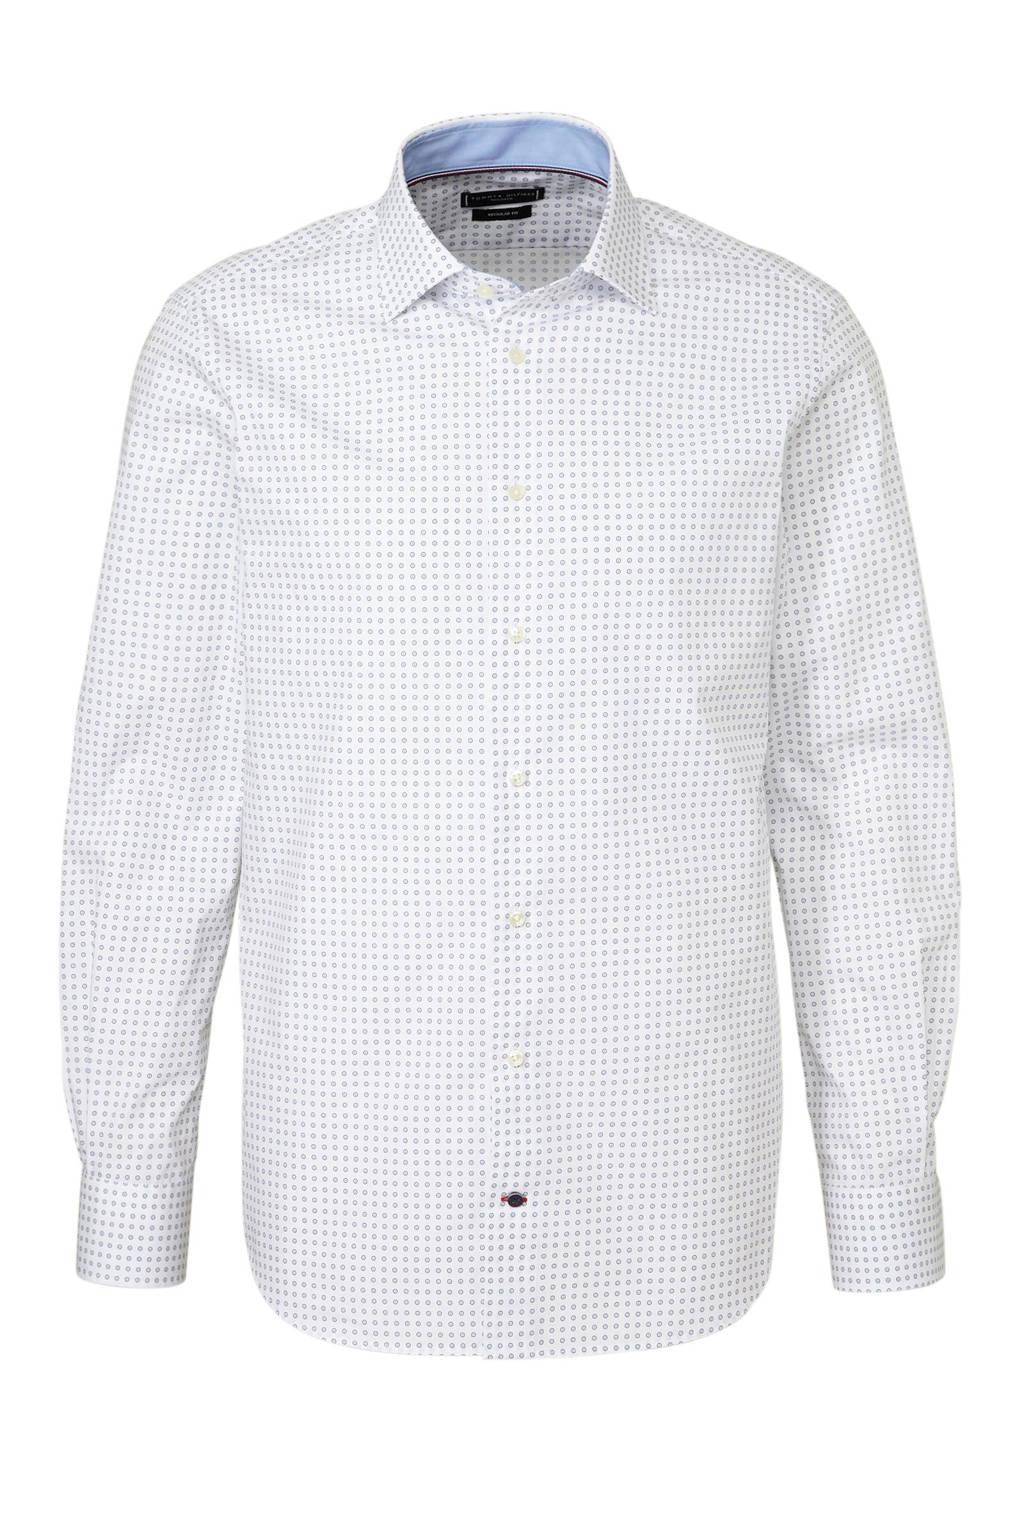 Tommy Hilfiger Tailored regular fit overhemd, Wit/blauw